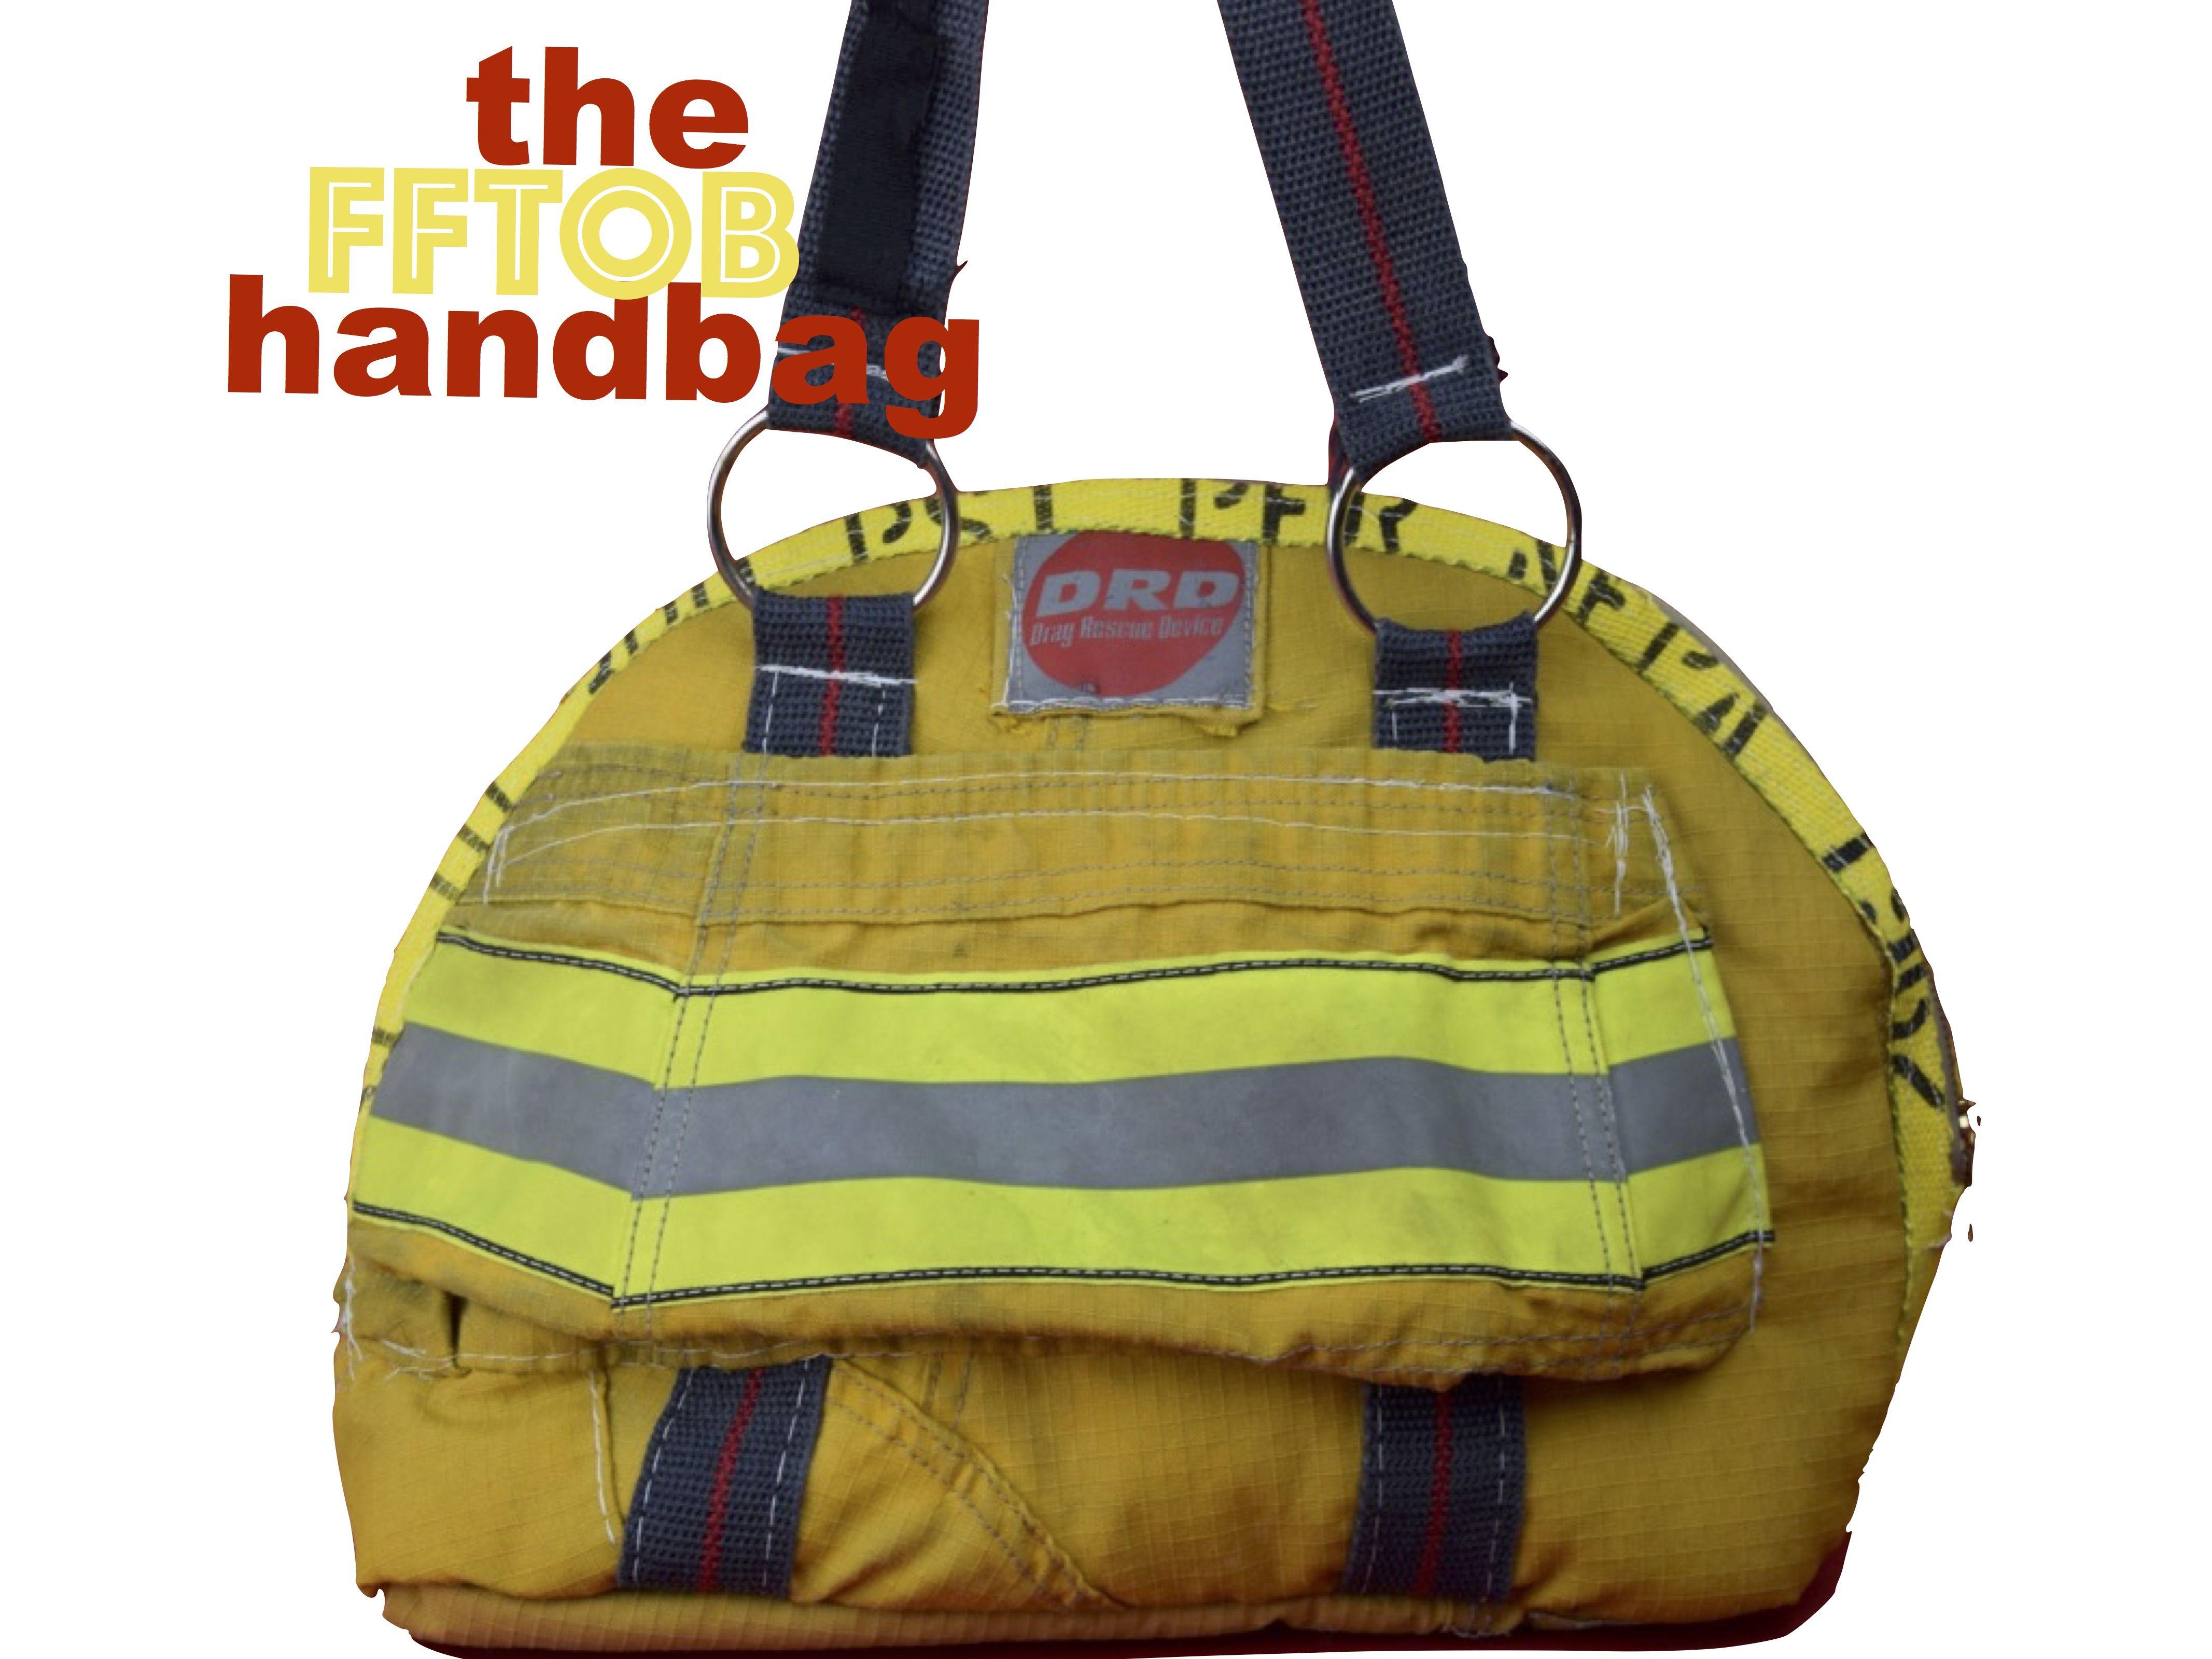 Firefighter Turnout Handbag Or Camera Case By Niki Rasor